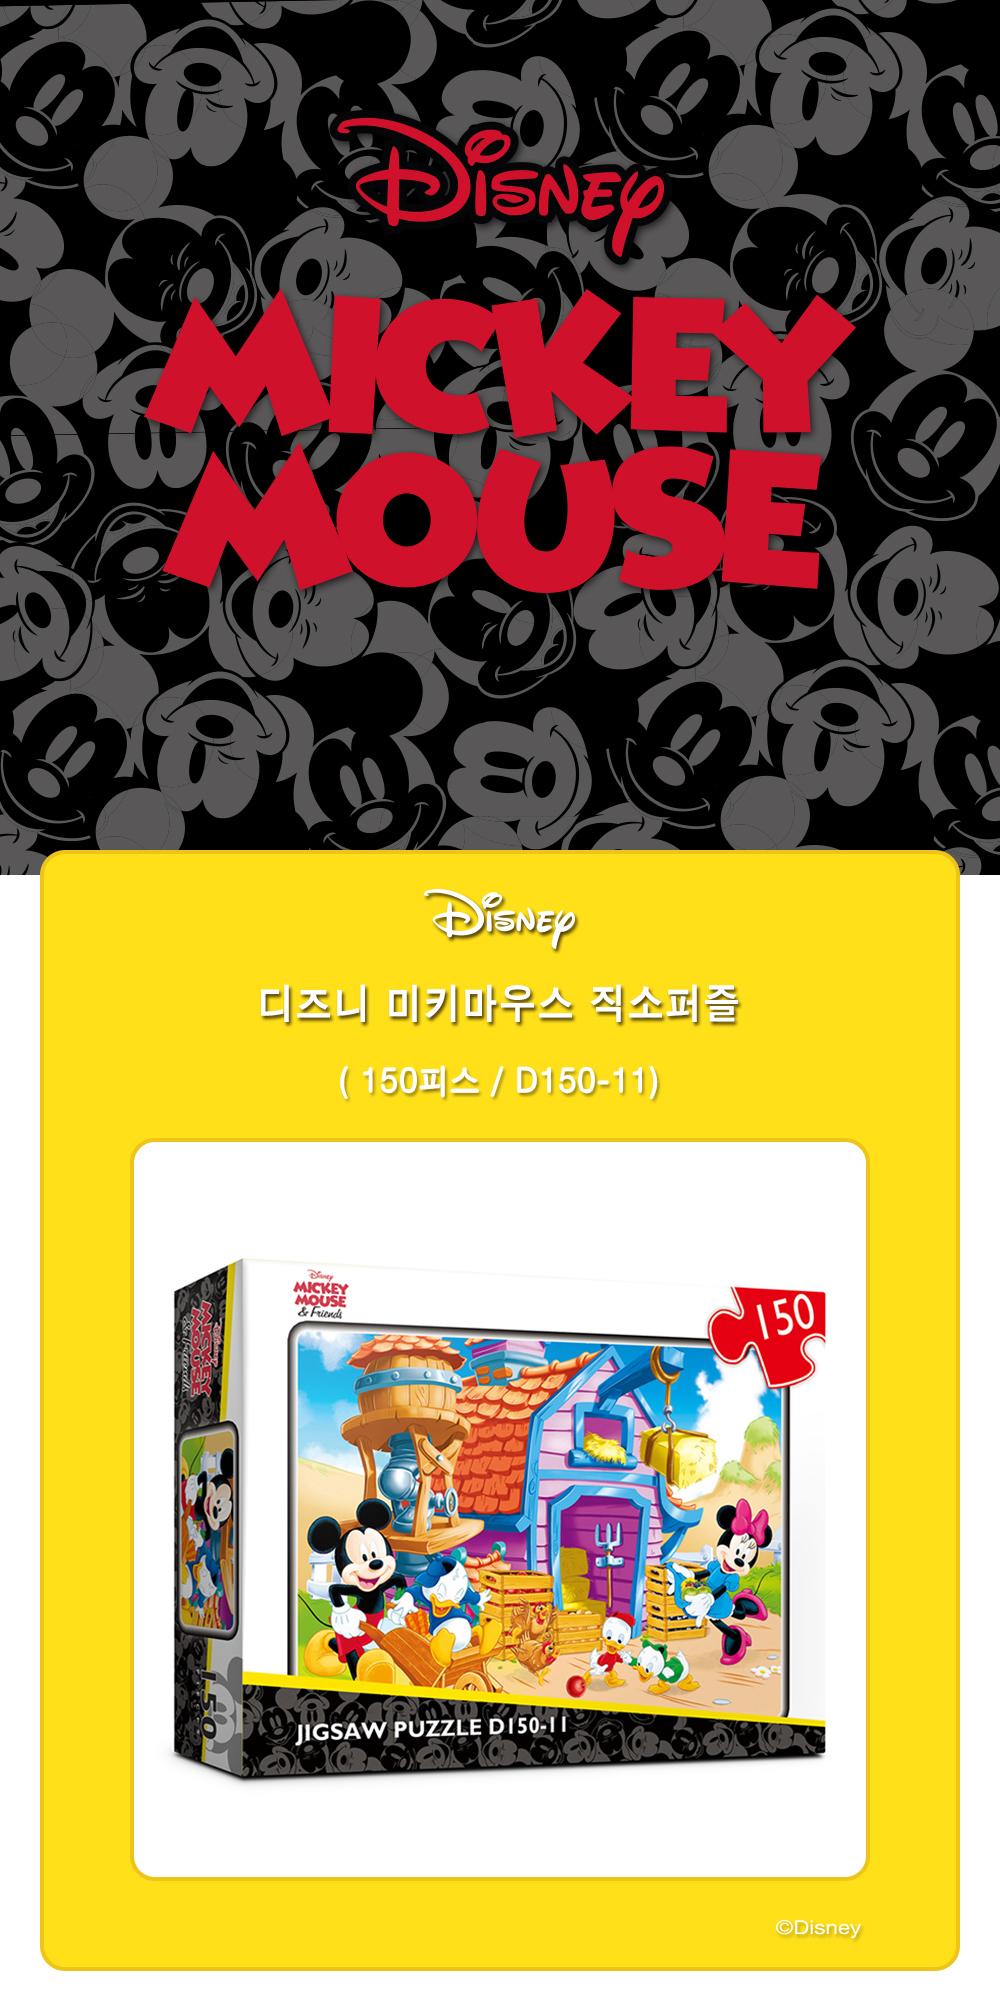 [Disney] 디즈니 미키마우스 직소퍼즐(150피스/D150-11) - 퍼즐라이프, 7,000원, 조각/퍼즐, 캐릭터 직소퍼즐